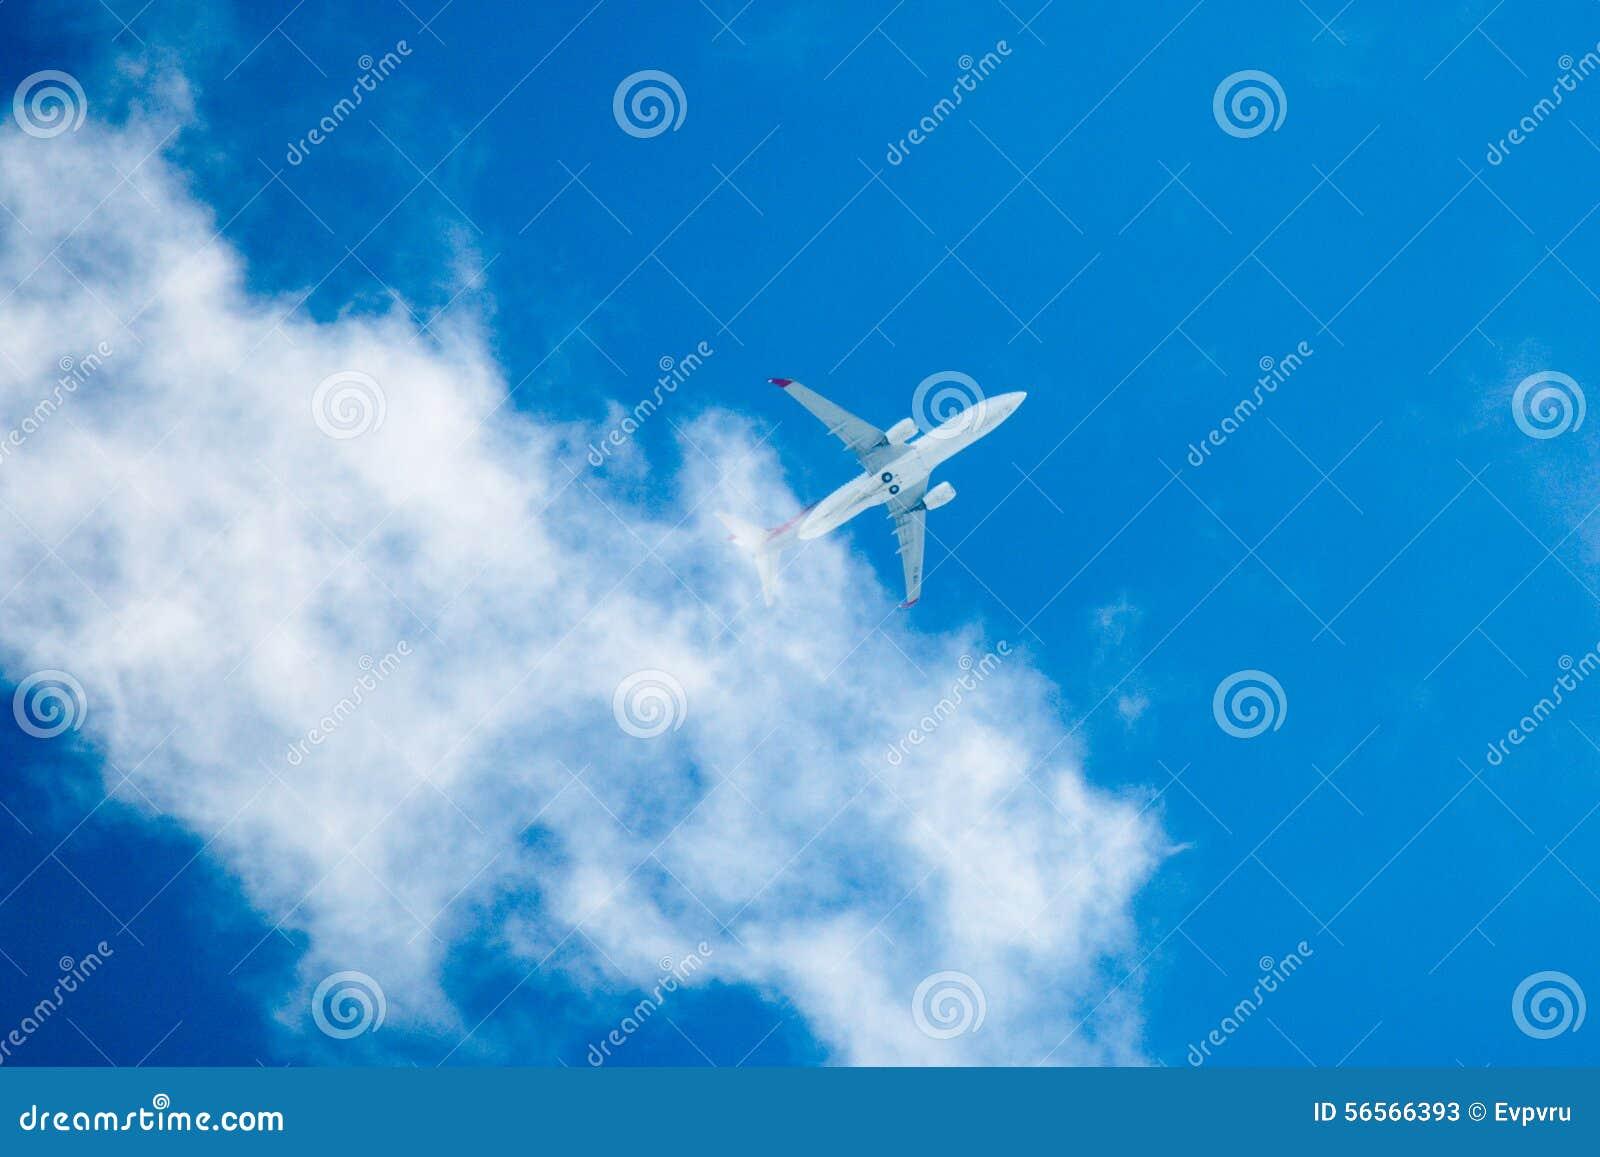 Download Αεροπλάνο στοκ εικόνα. εικόνα από εμπορικός, ουρανός - 56566393